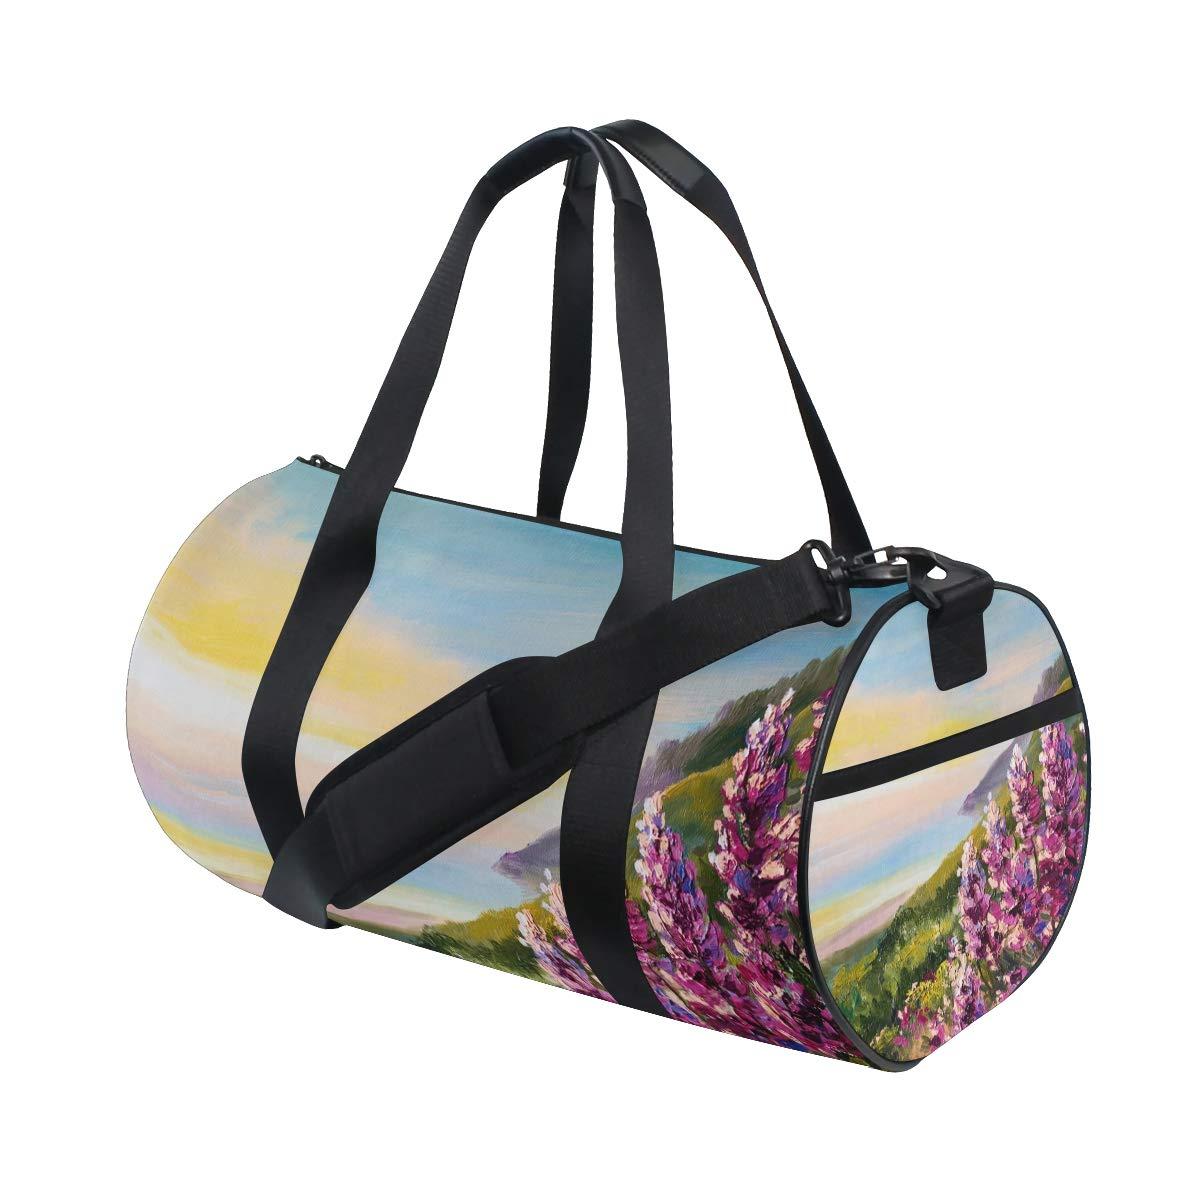 Sports Gym Bag Travel Duffel Bag with Pockets Luggage & Travel Gear Shoulder Strap Fitness Bag